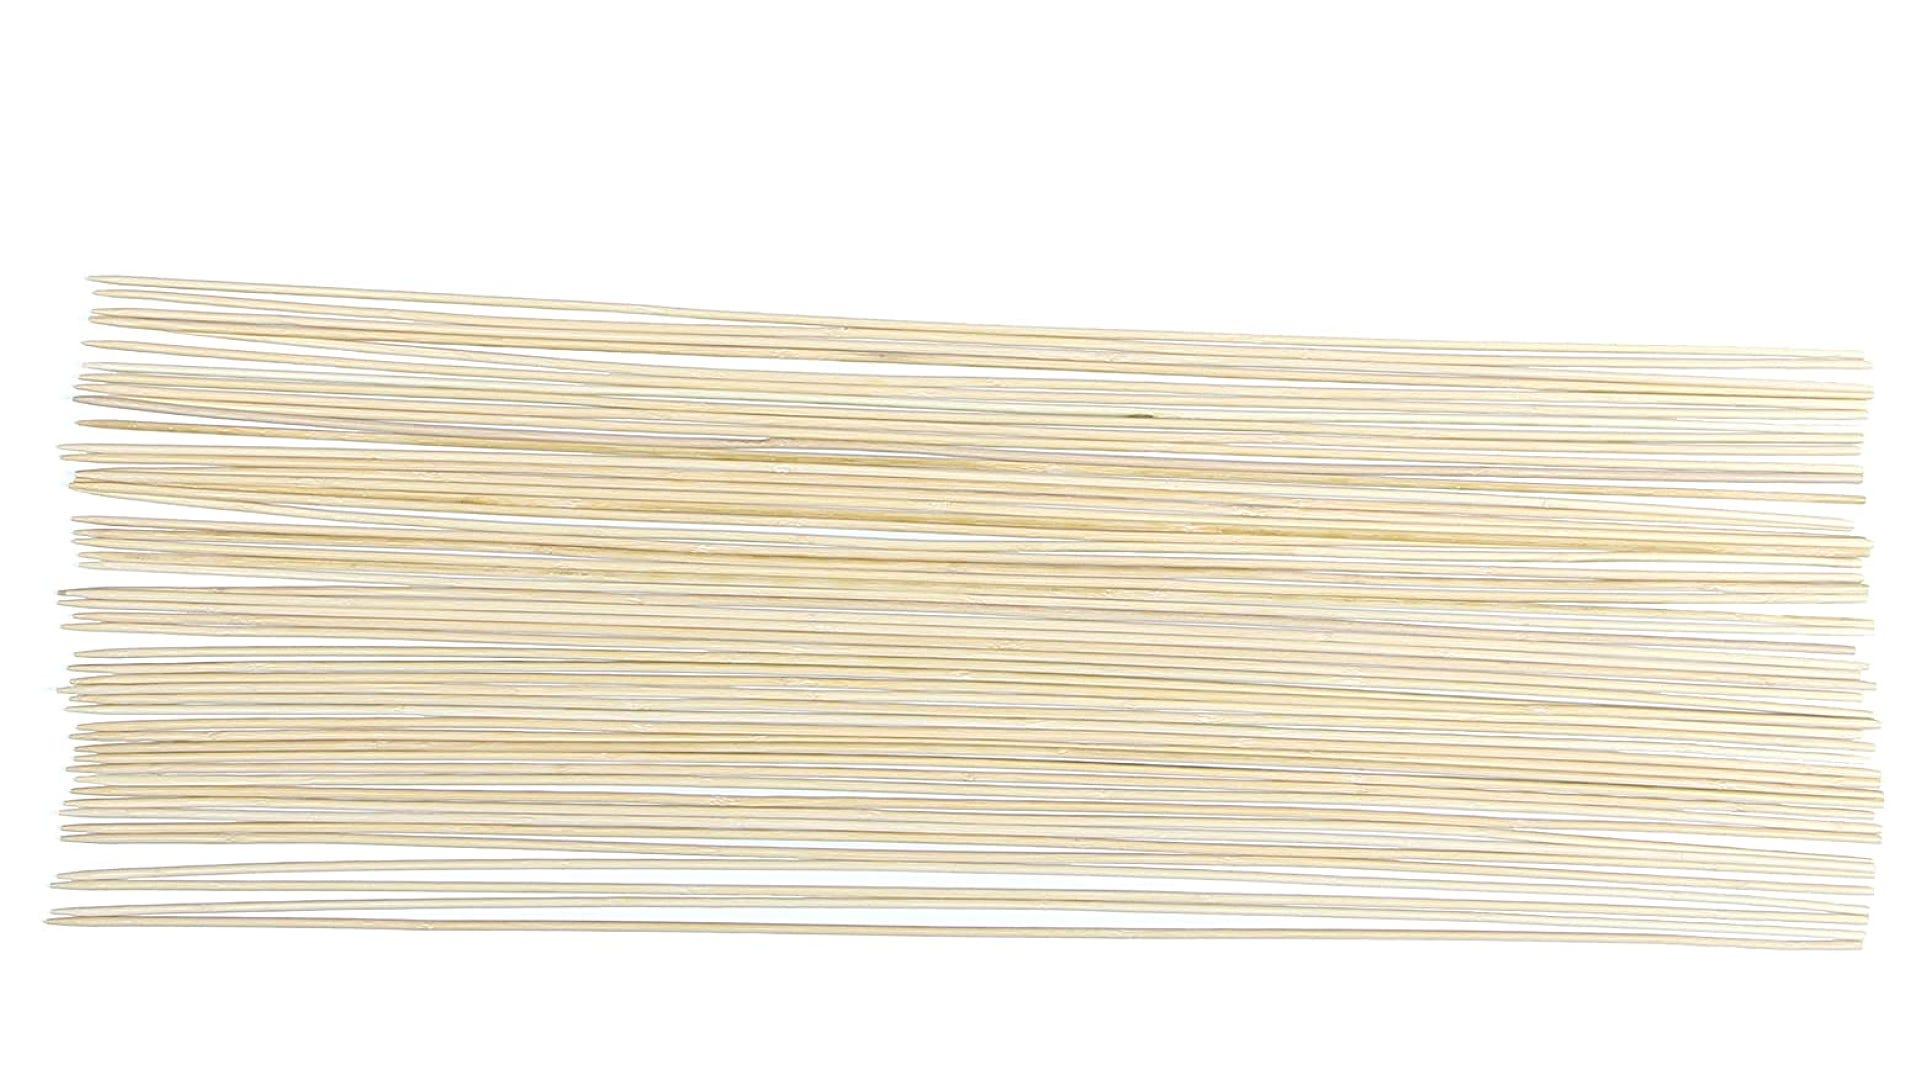 large pack of bamboo roasting sticks